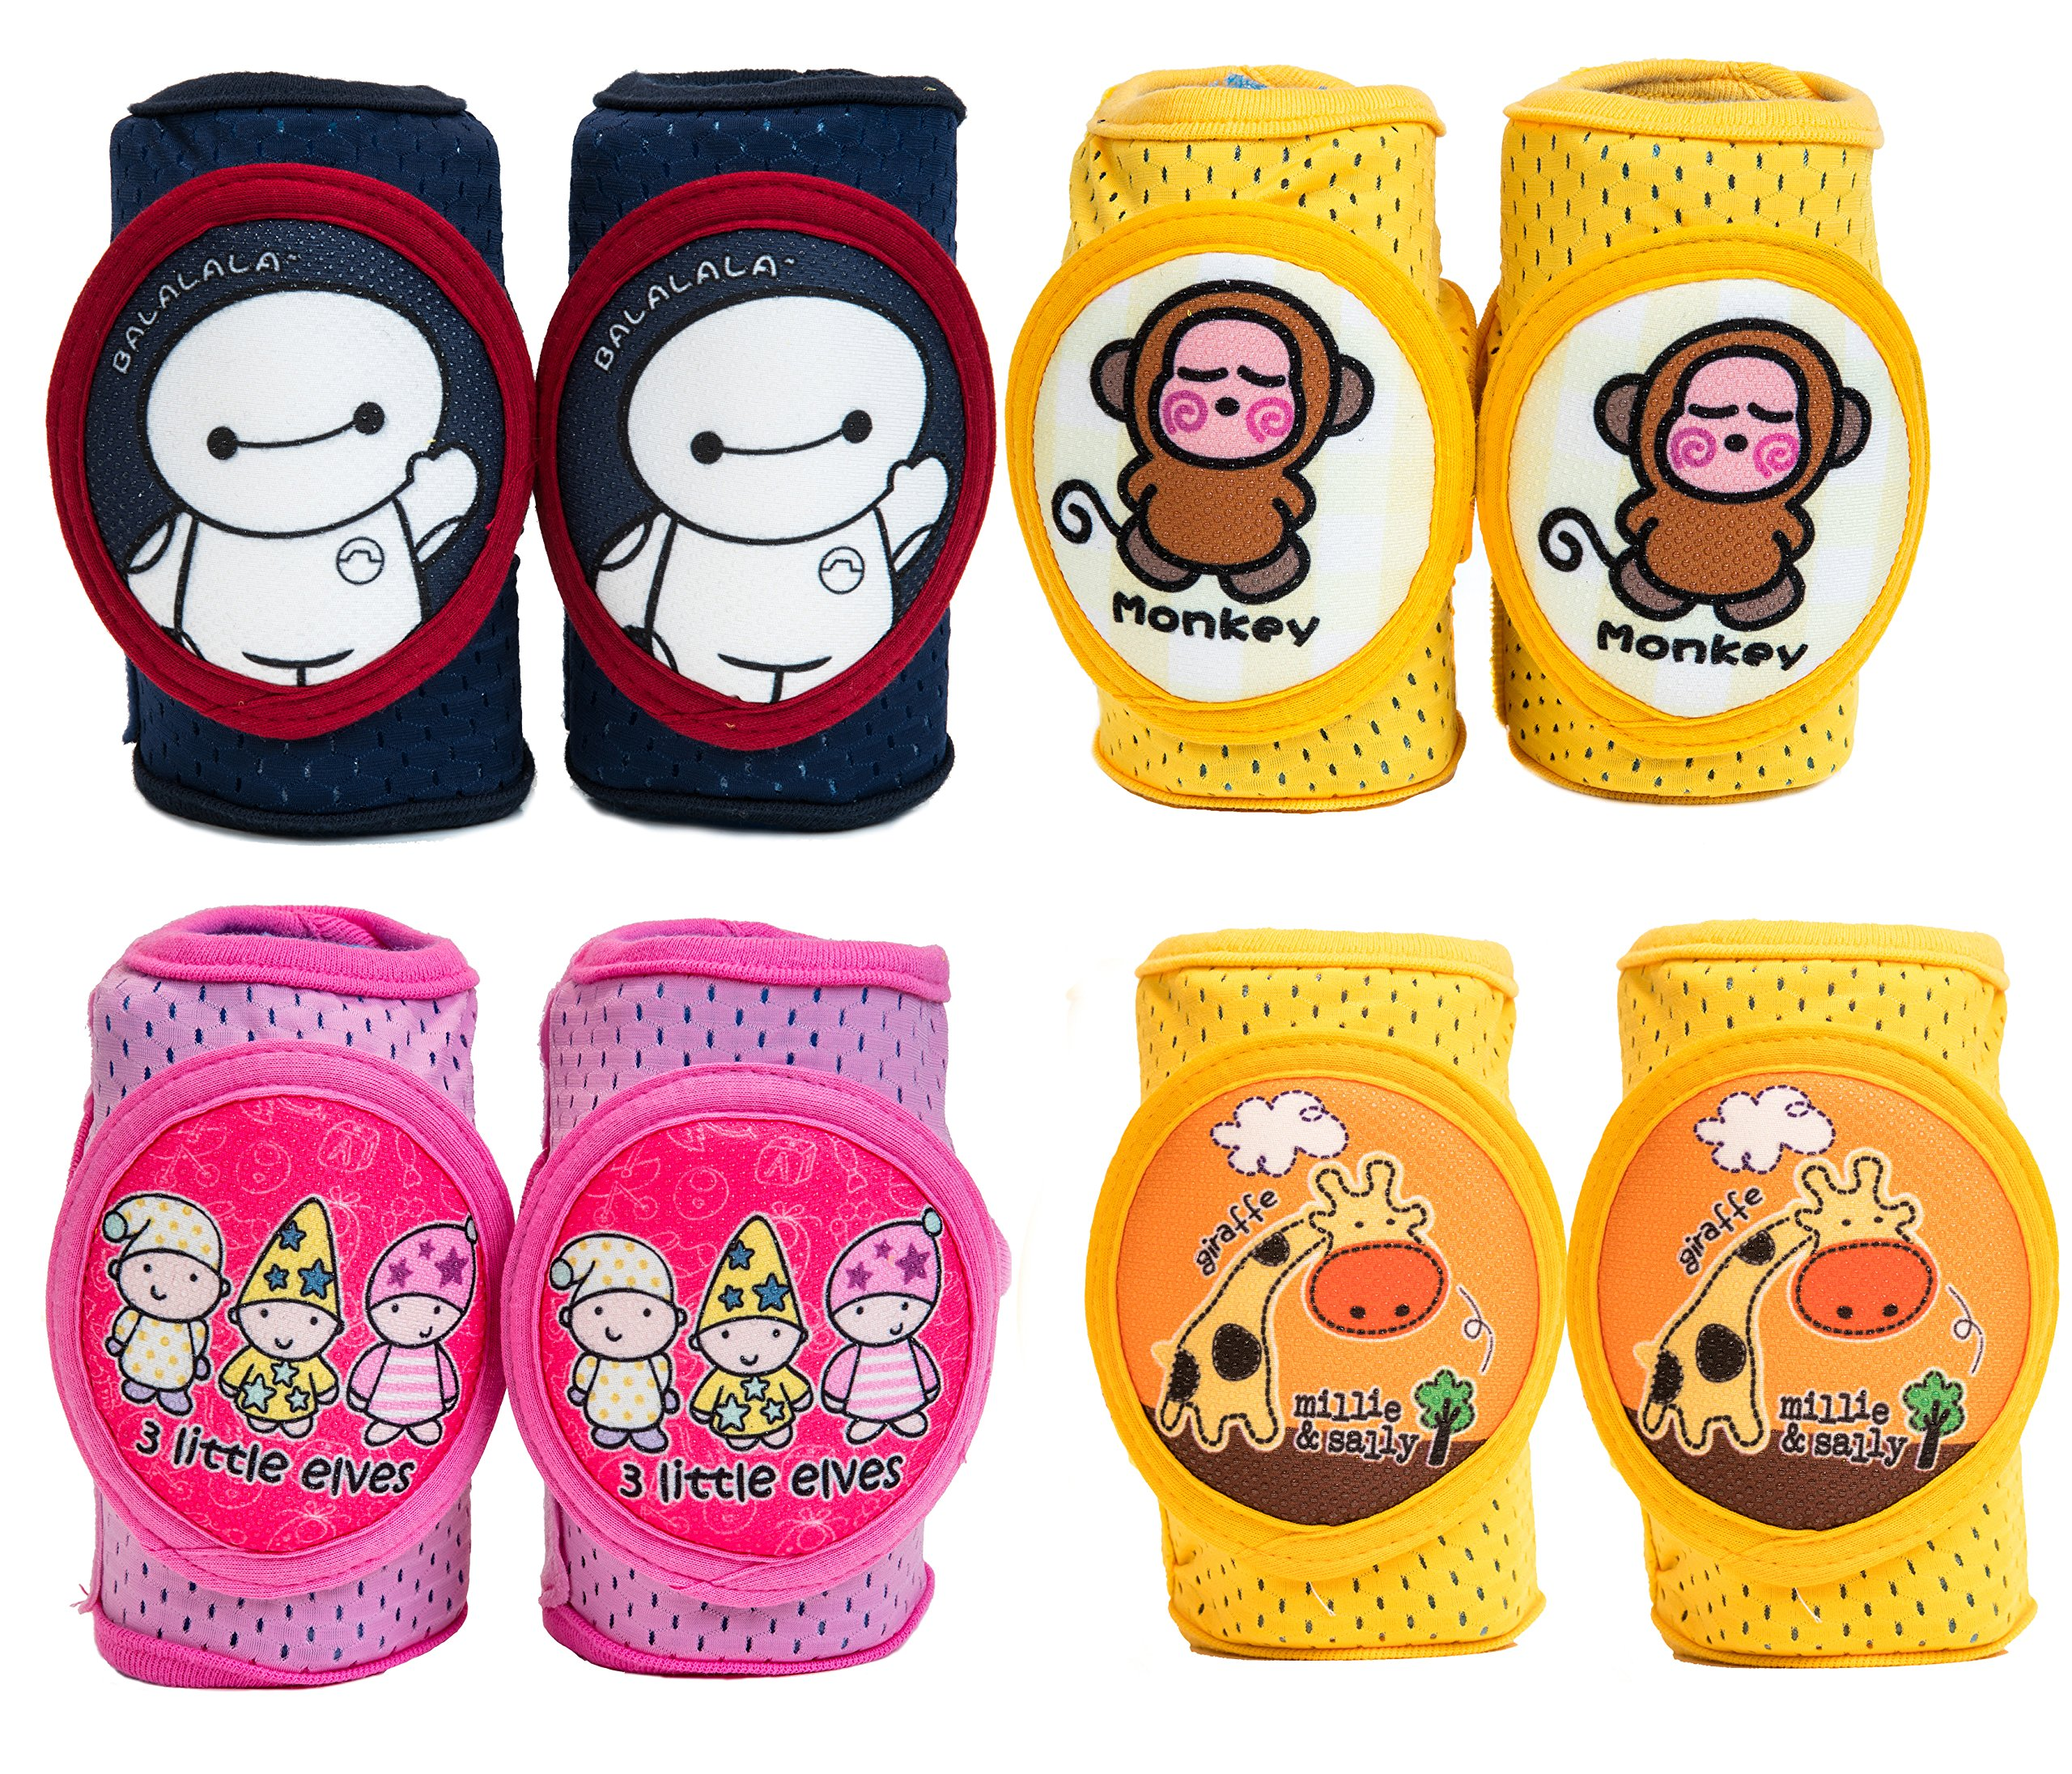 Baby Knee Pads Anti-Slip Walking Kneepads Adjustable Hook & Loop Strap Unisex For Boys Girls Infant Toddler Knee & Elbow Pads Memory Foam Pad Cushion Breathable Mesh Fabric Knee Pads For Babies